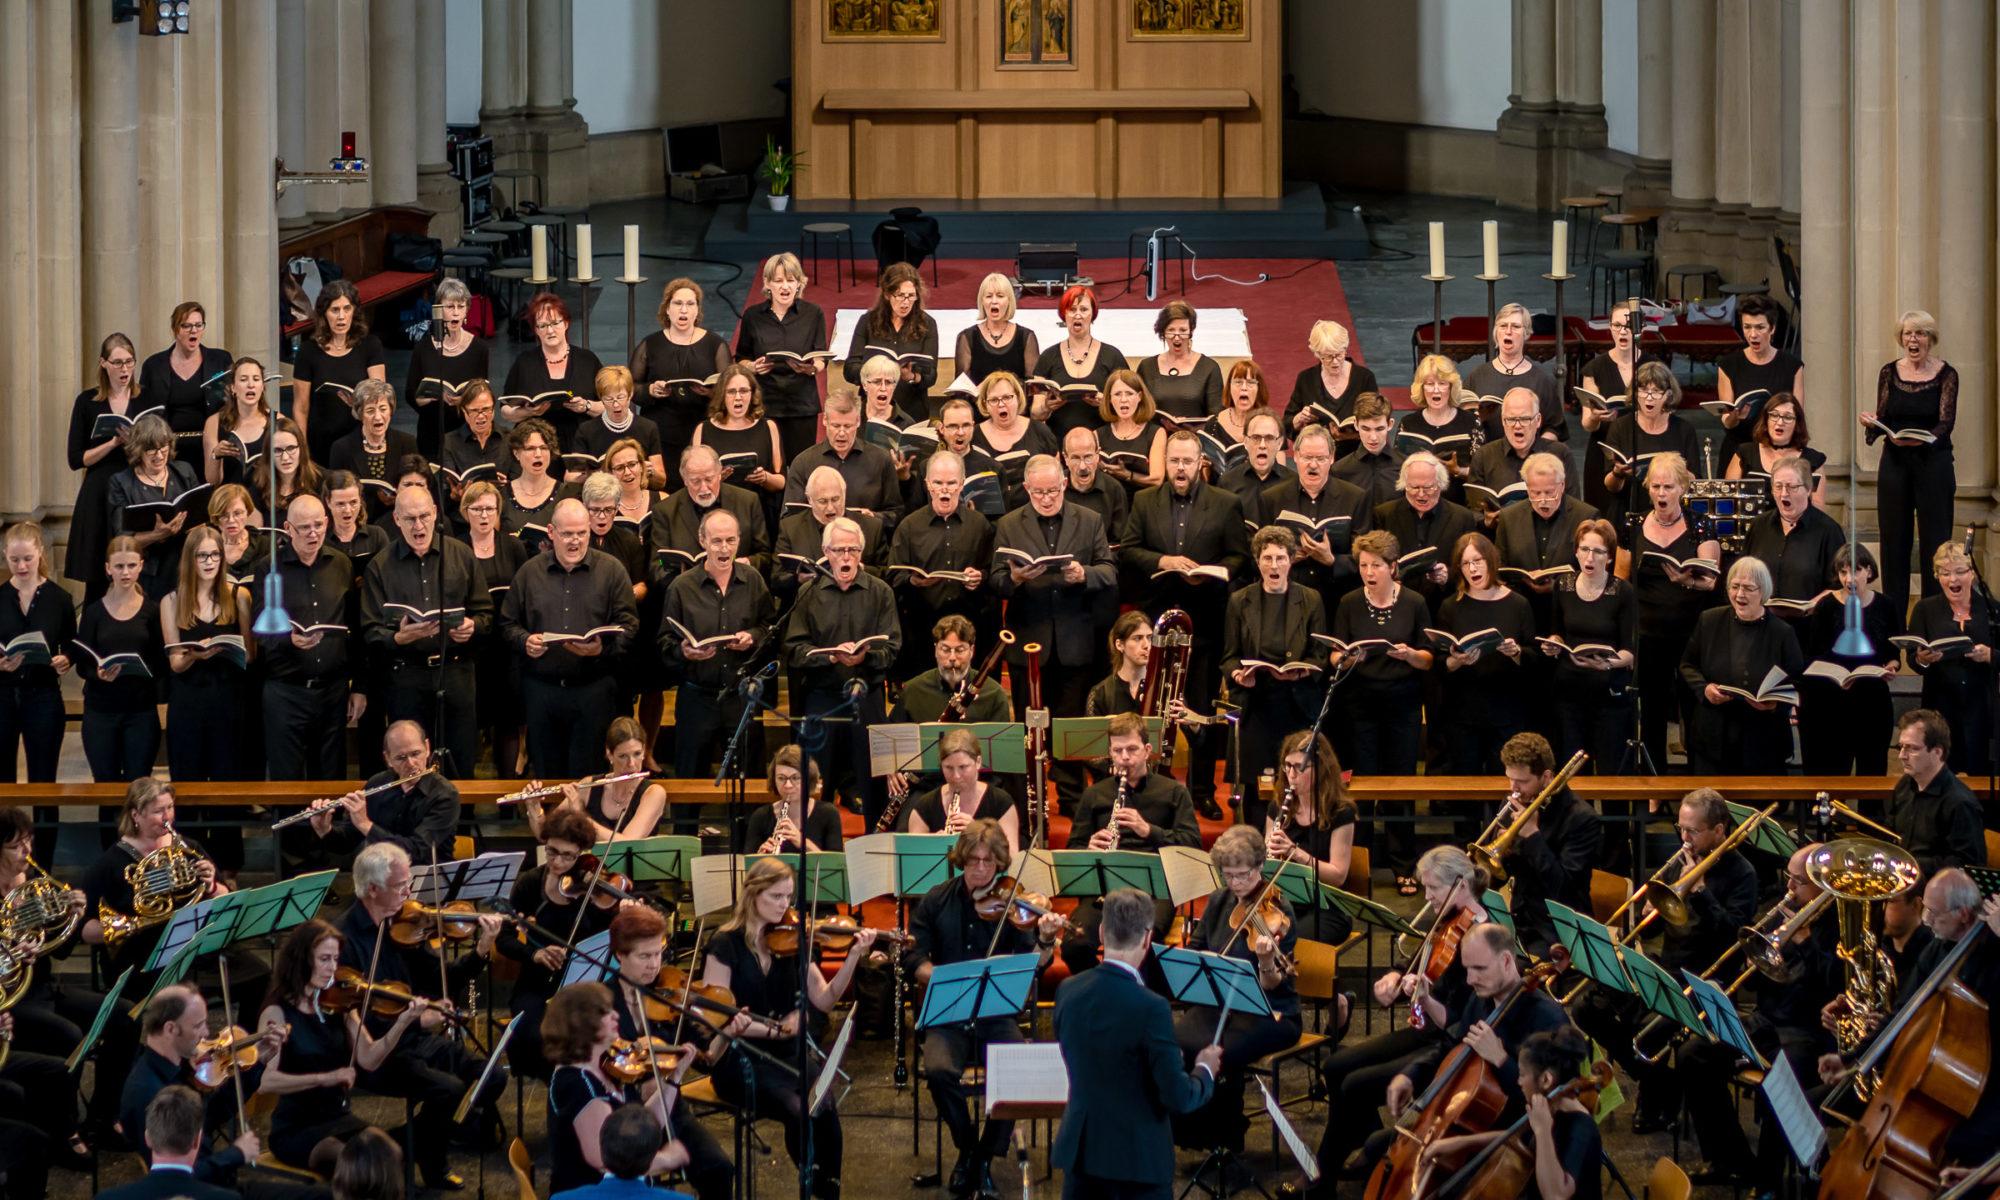 Förderverein Kirchenmusik Krefeld